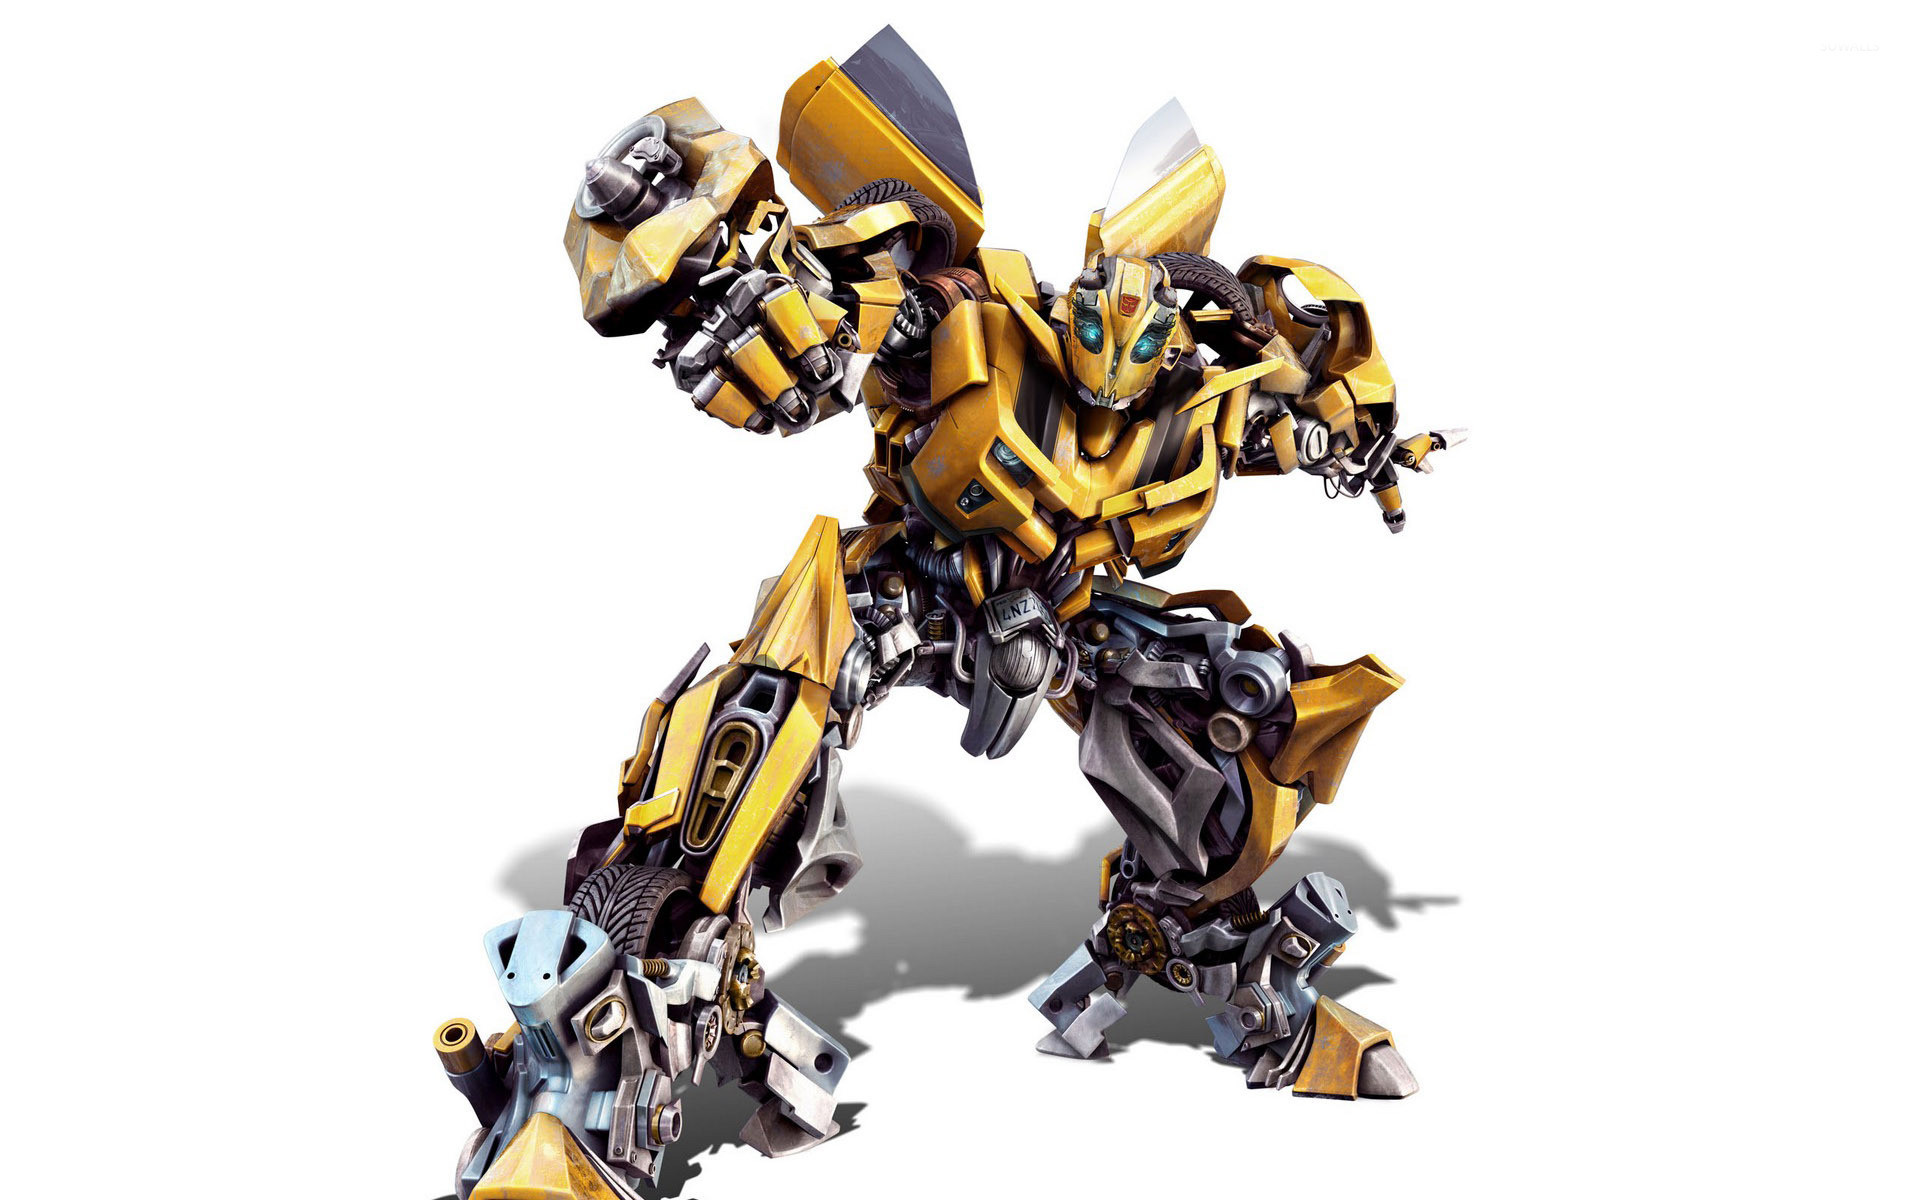 Res: 1920x1200, Bumblebee - Transformers [8] wallpaper